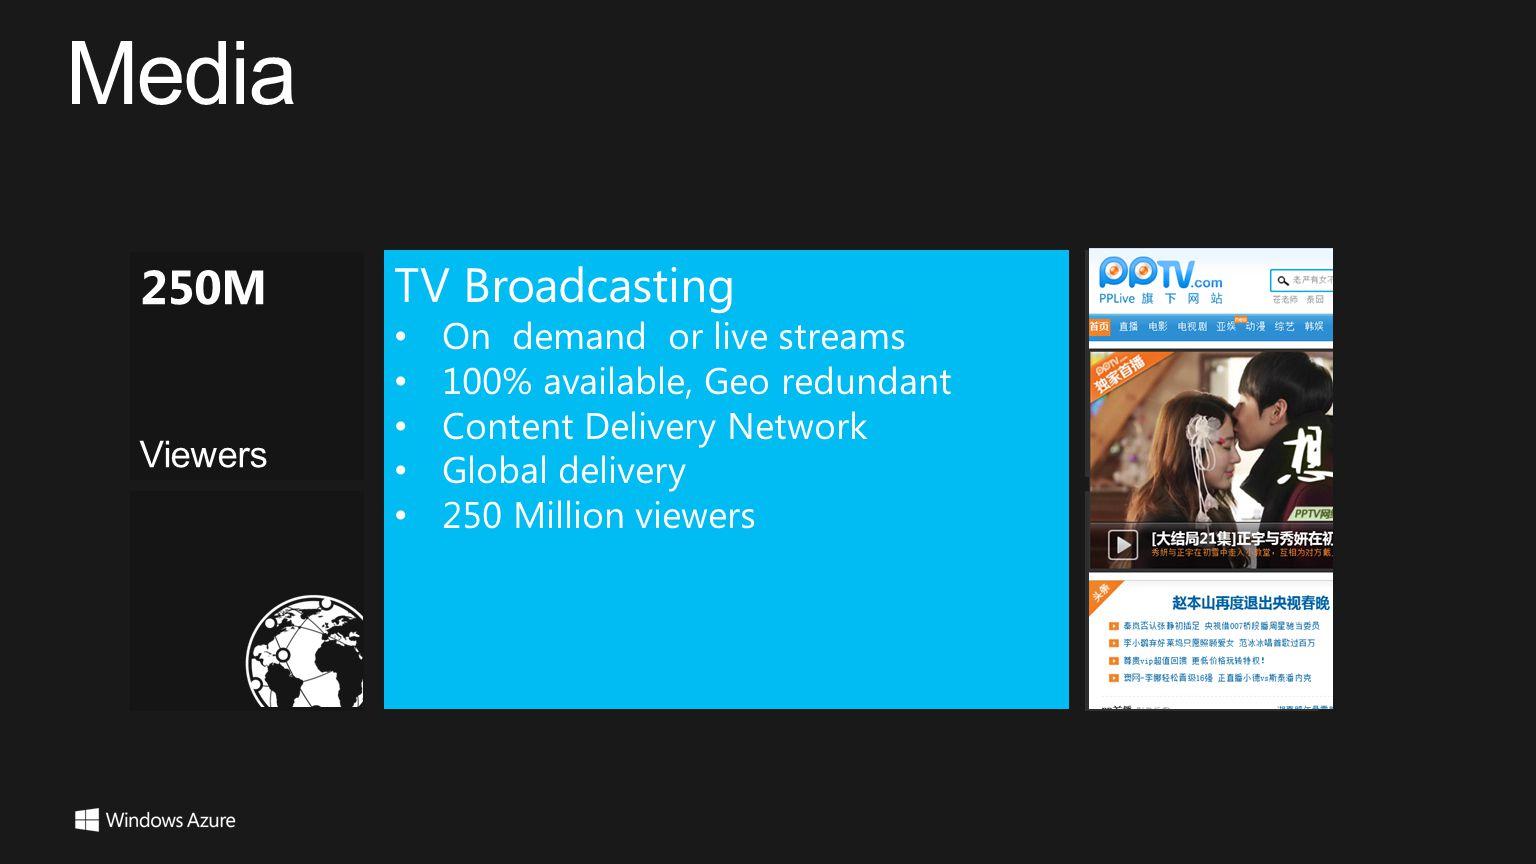 Media 250M TV Broadcasting On demand or live streams